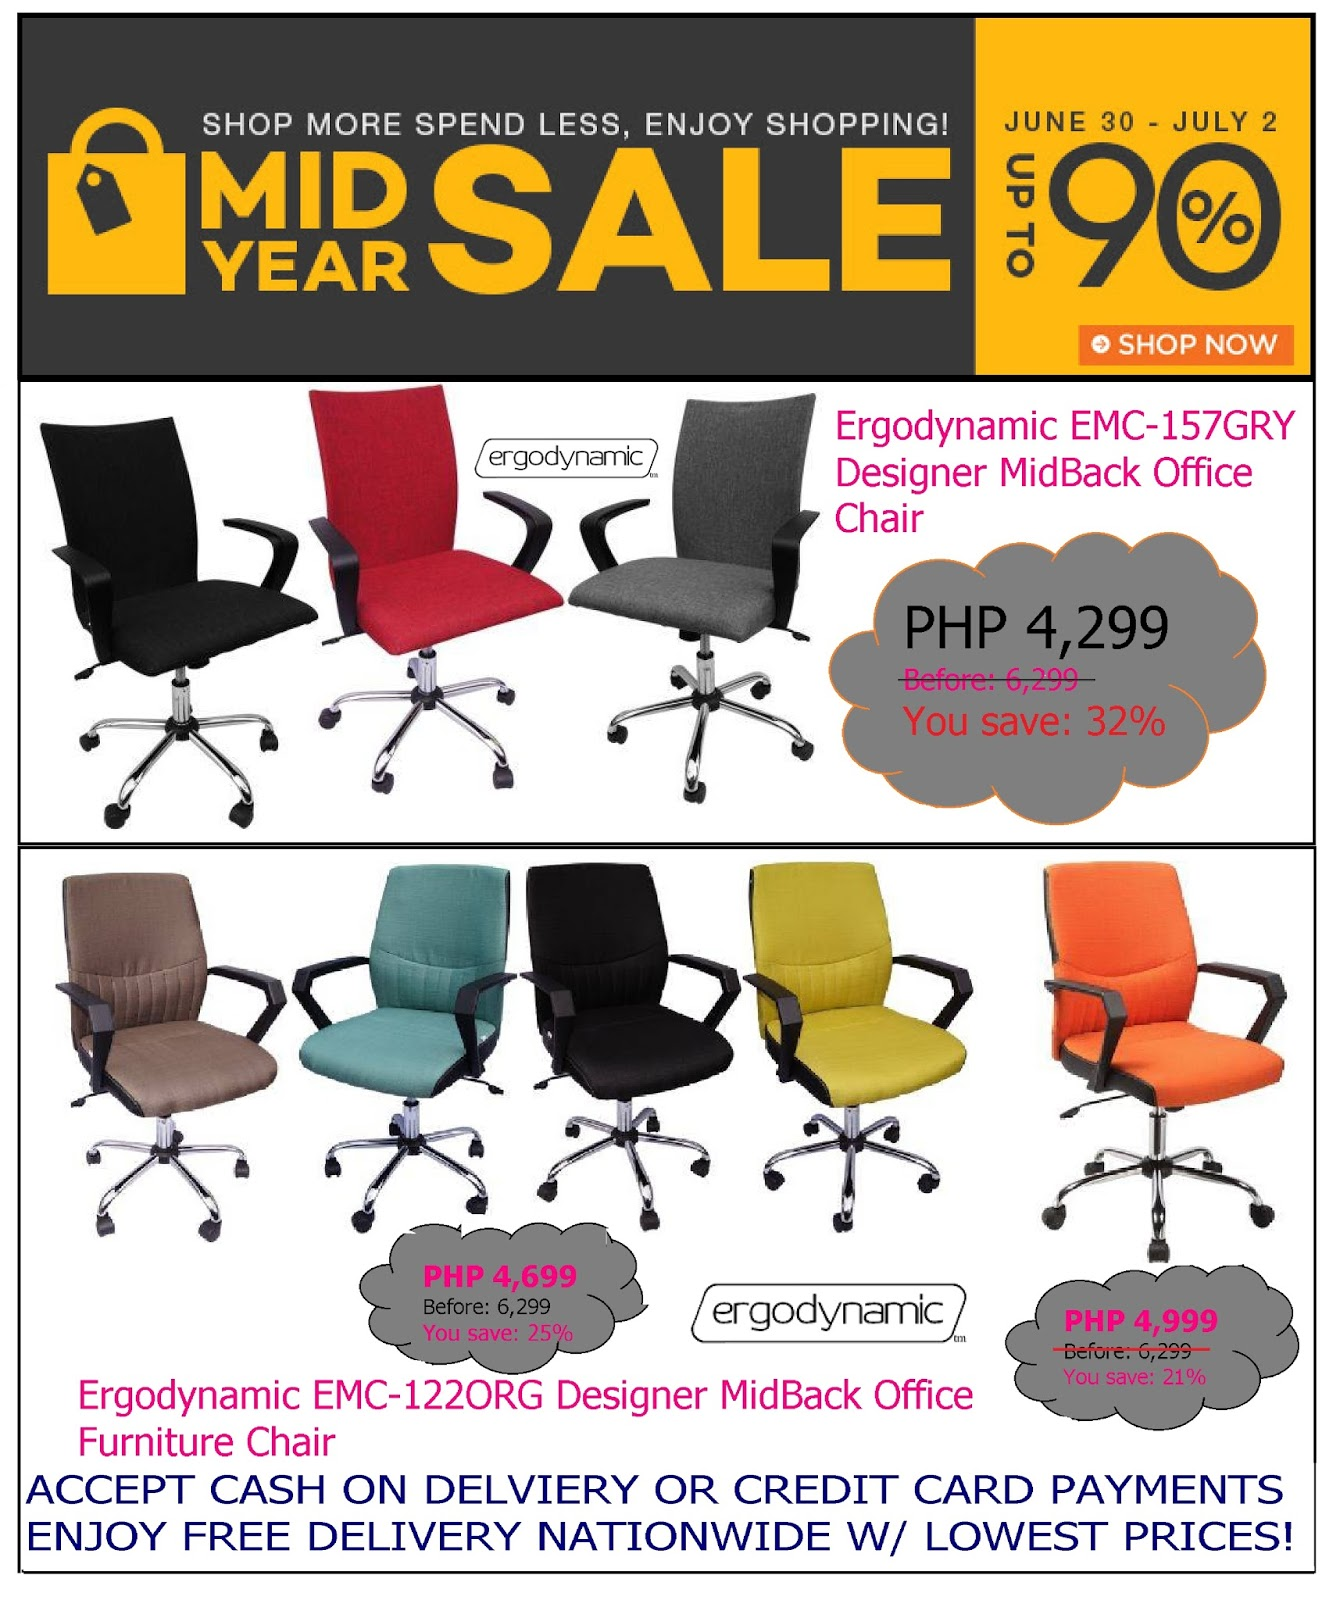 cost u less office furniture manila furniture supplier office furniture manchester office furniture malaysia